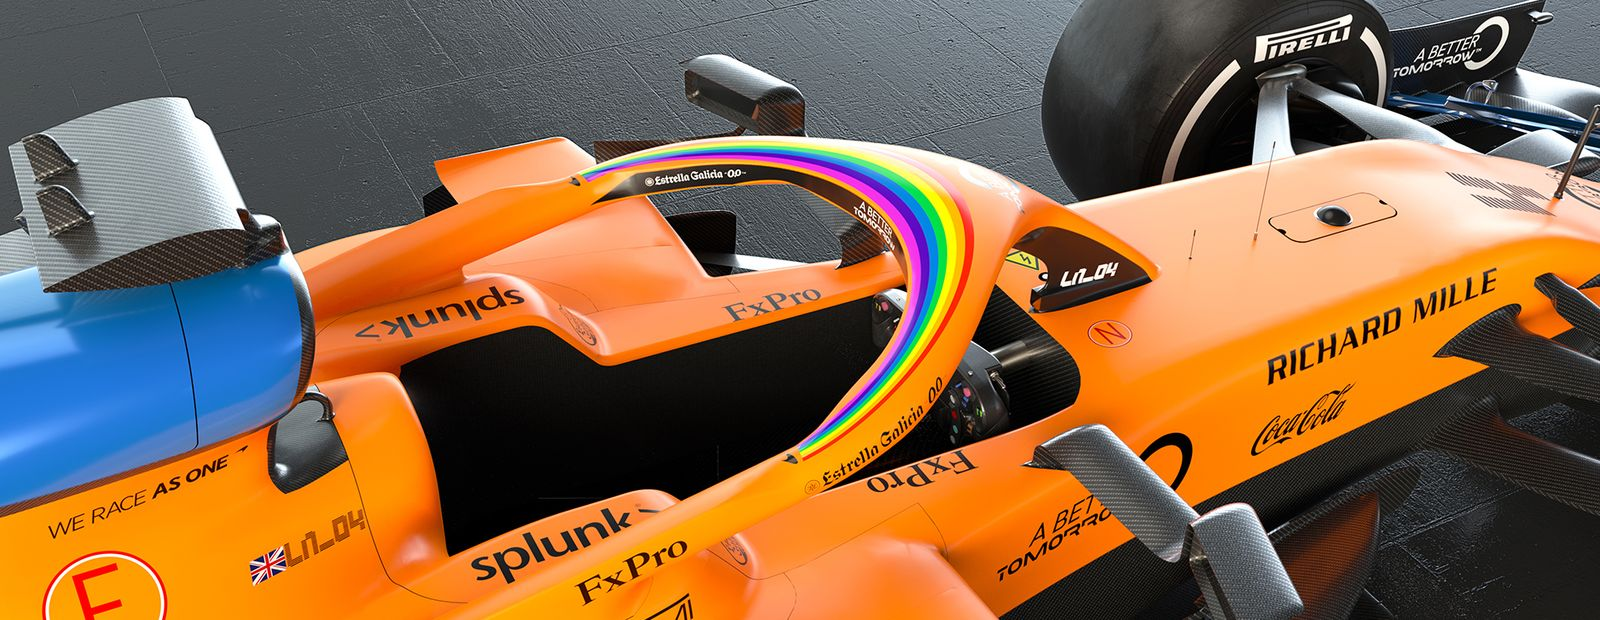 McLaren Racing supports Formula 1's #WeRaceAsOne campaign